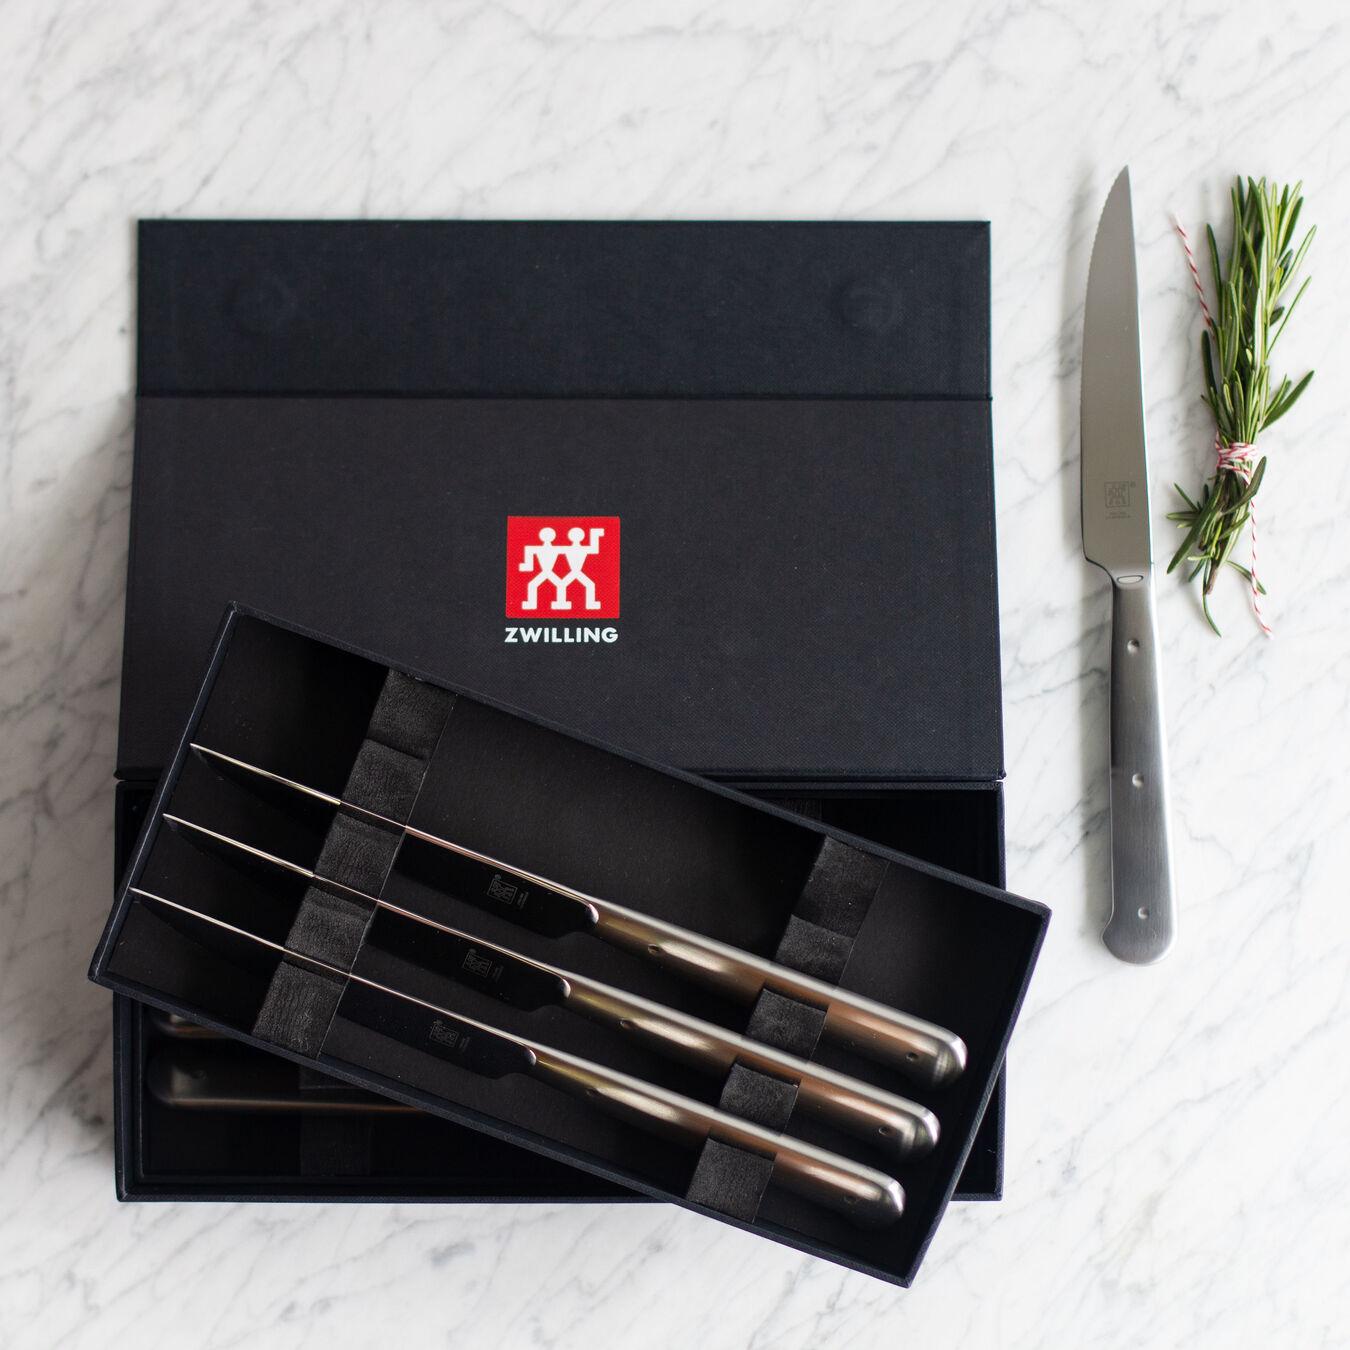 8-pc, stainless steel Porterhouse Steak Knife Set in Black Presentation Box,,large 5